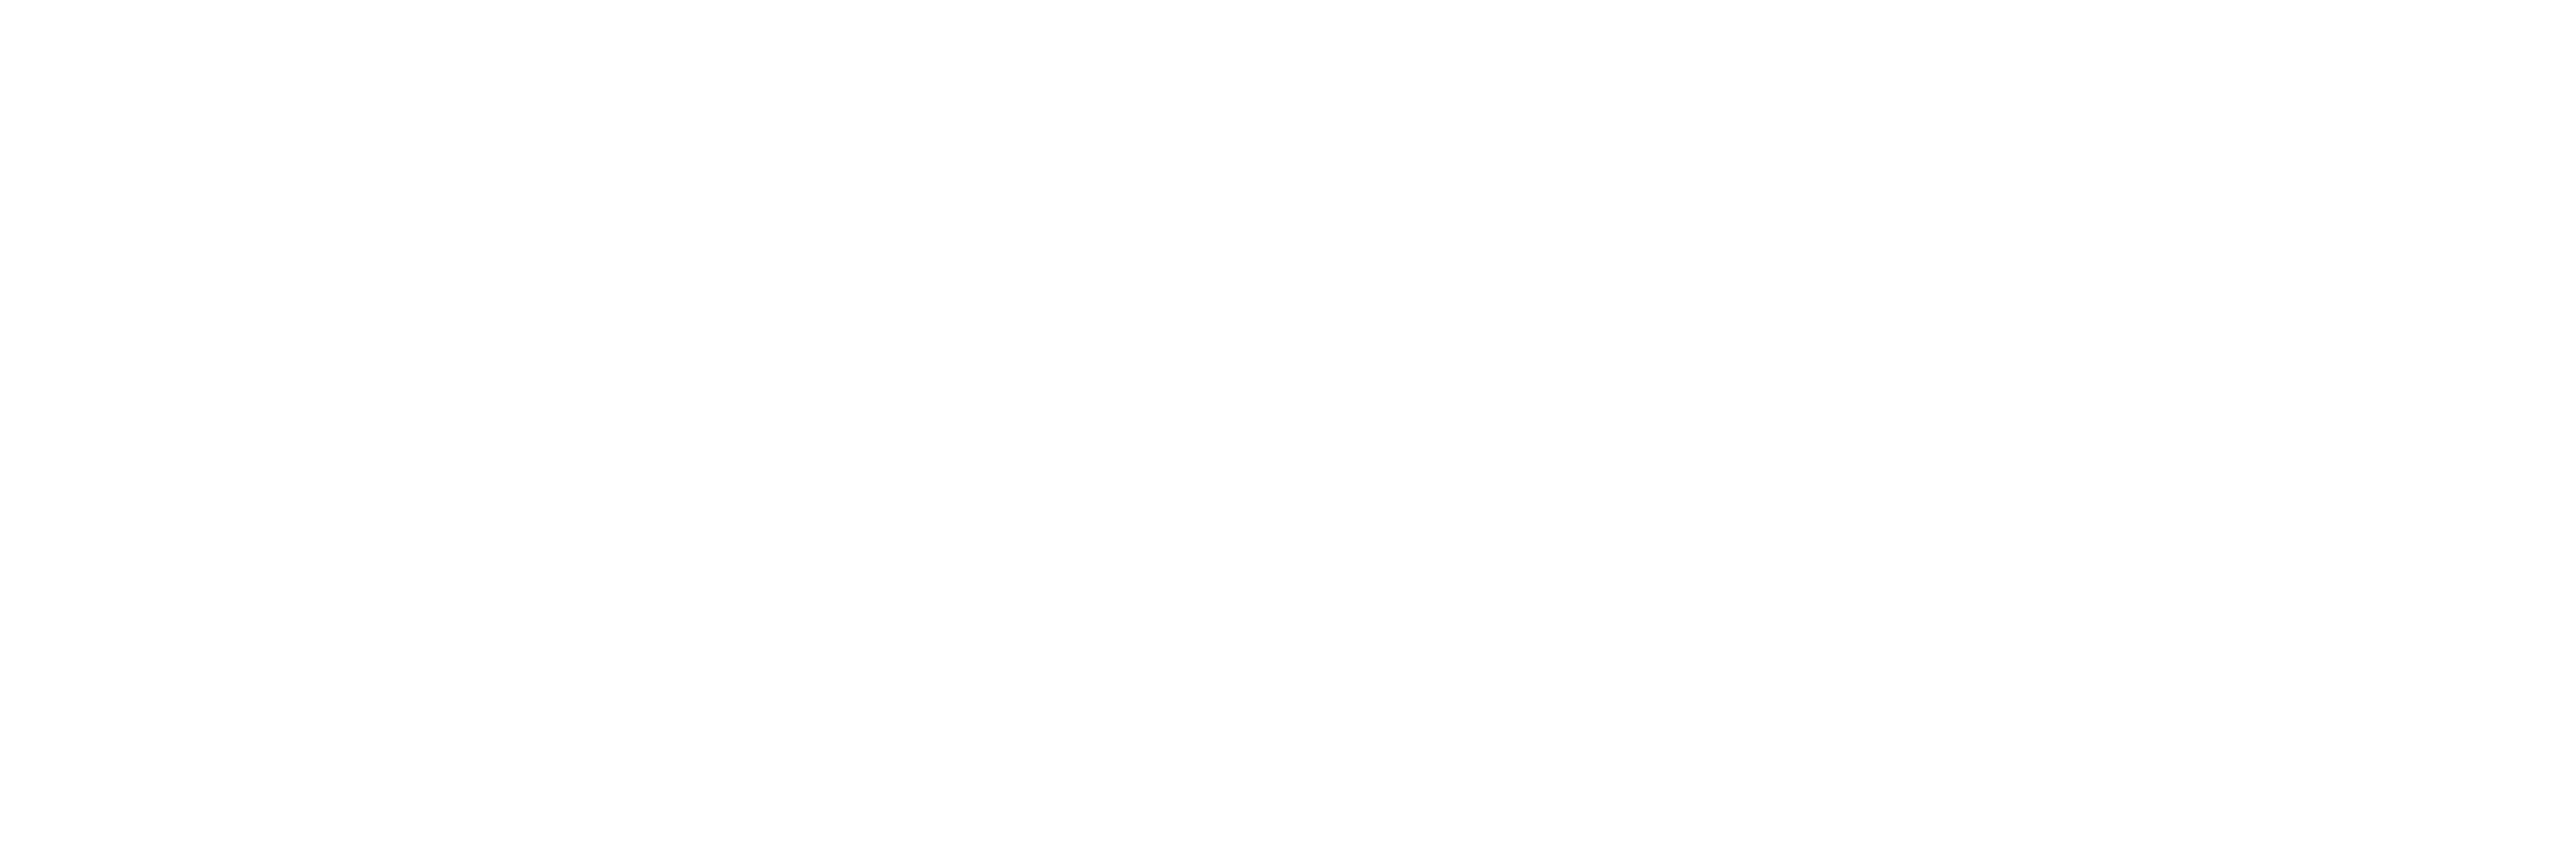 iZotopeLogo_onblack_trans